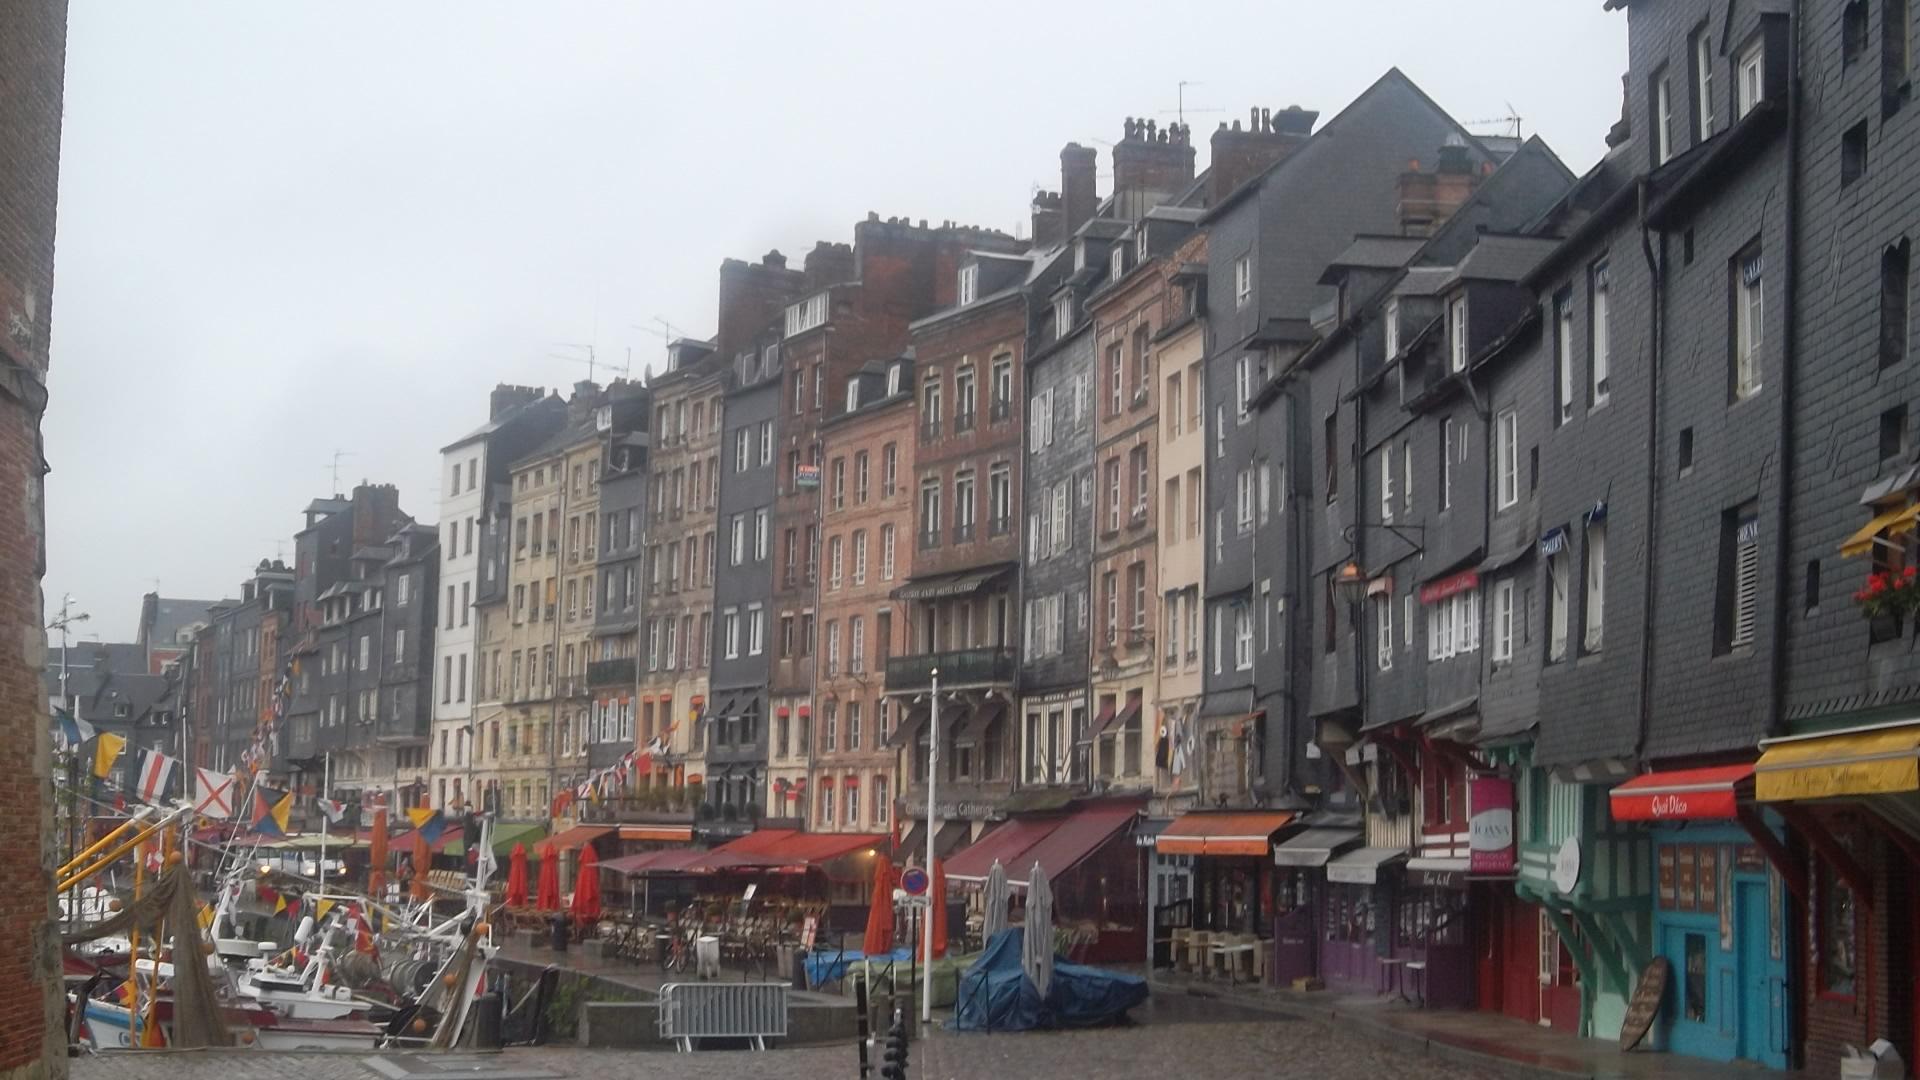 honfleur-quai-sainte-catherine-my13